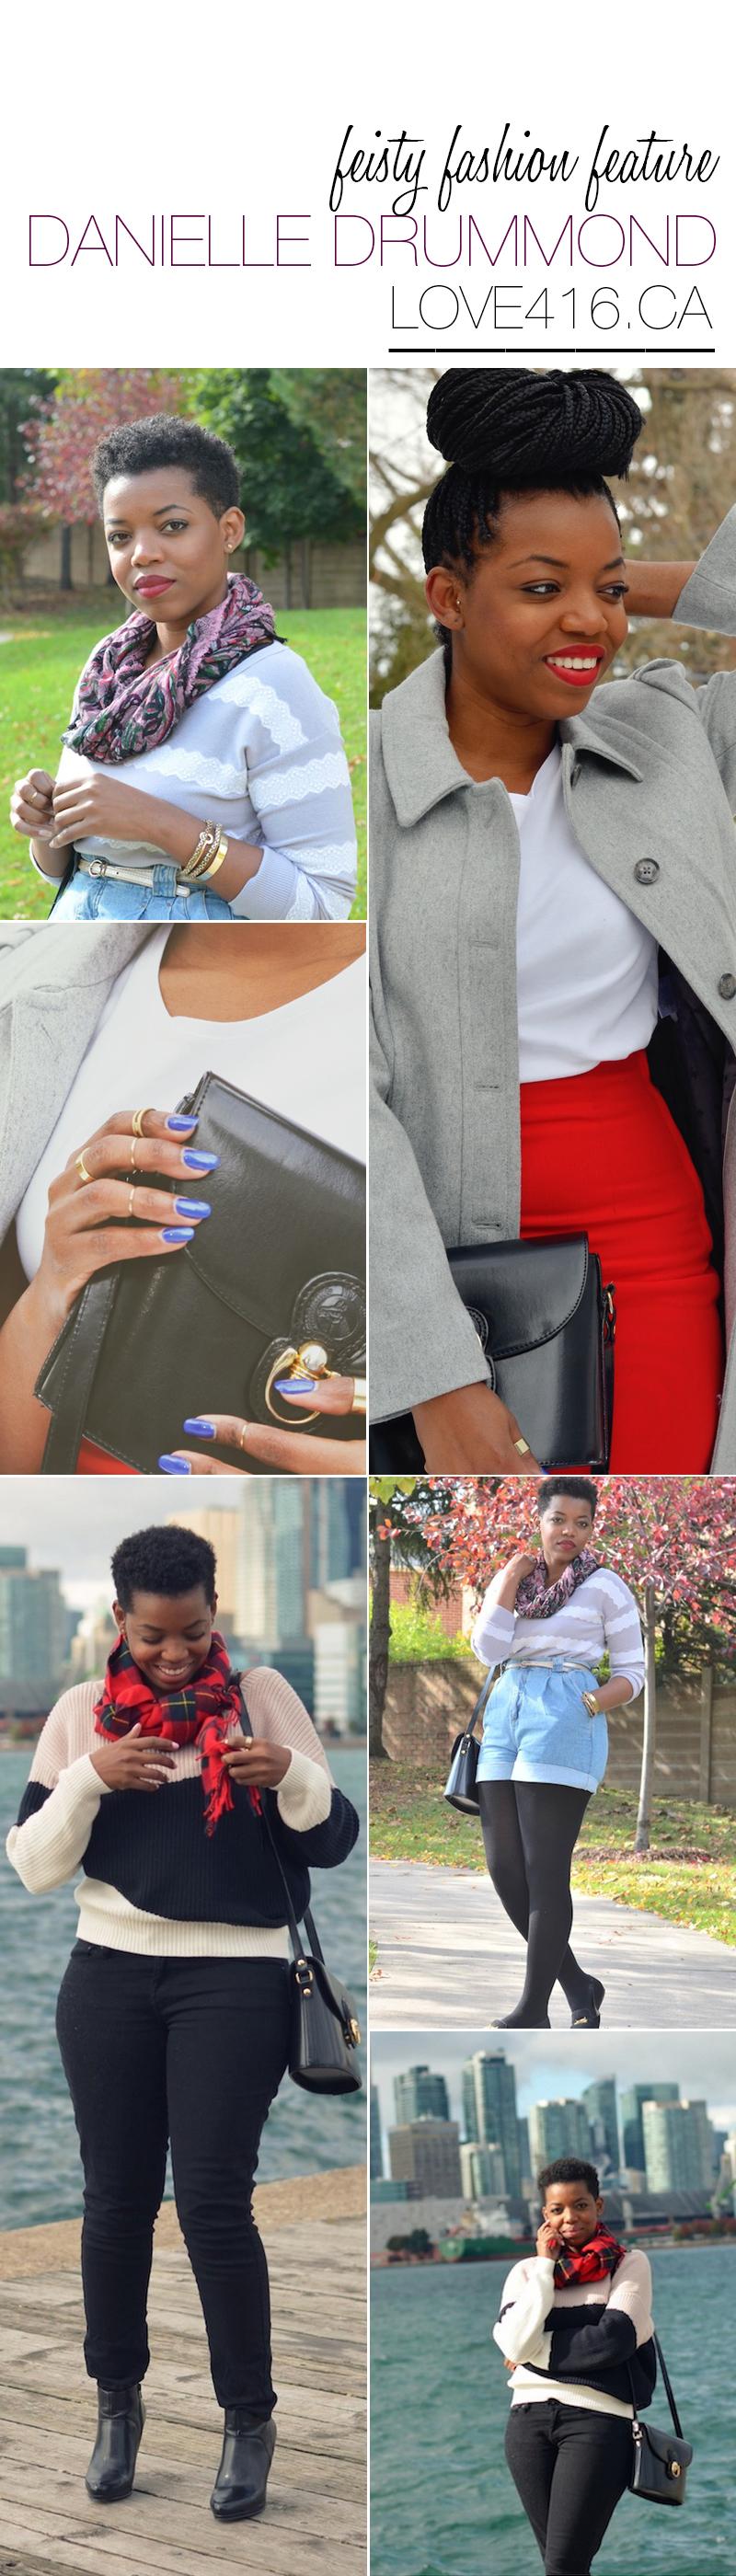 black fashion blog, black fashion blogger, black lifestyle blog, canadian blogger danielle drummond of love 416, black style blogger, feisty fashion feature